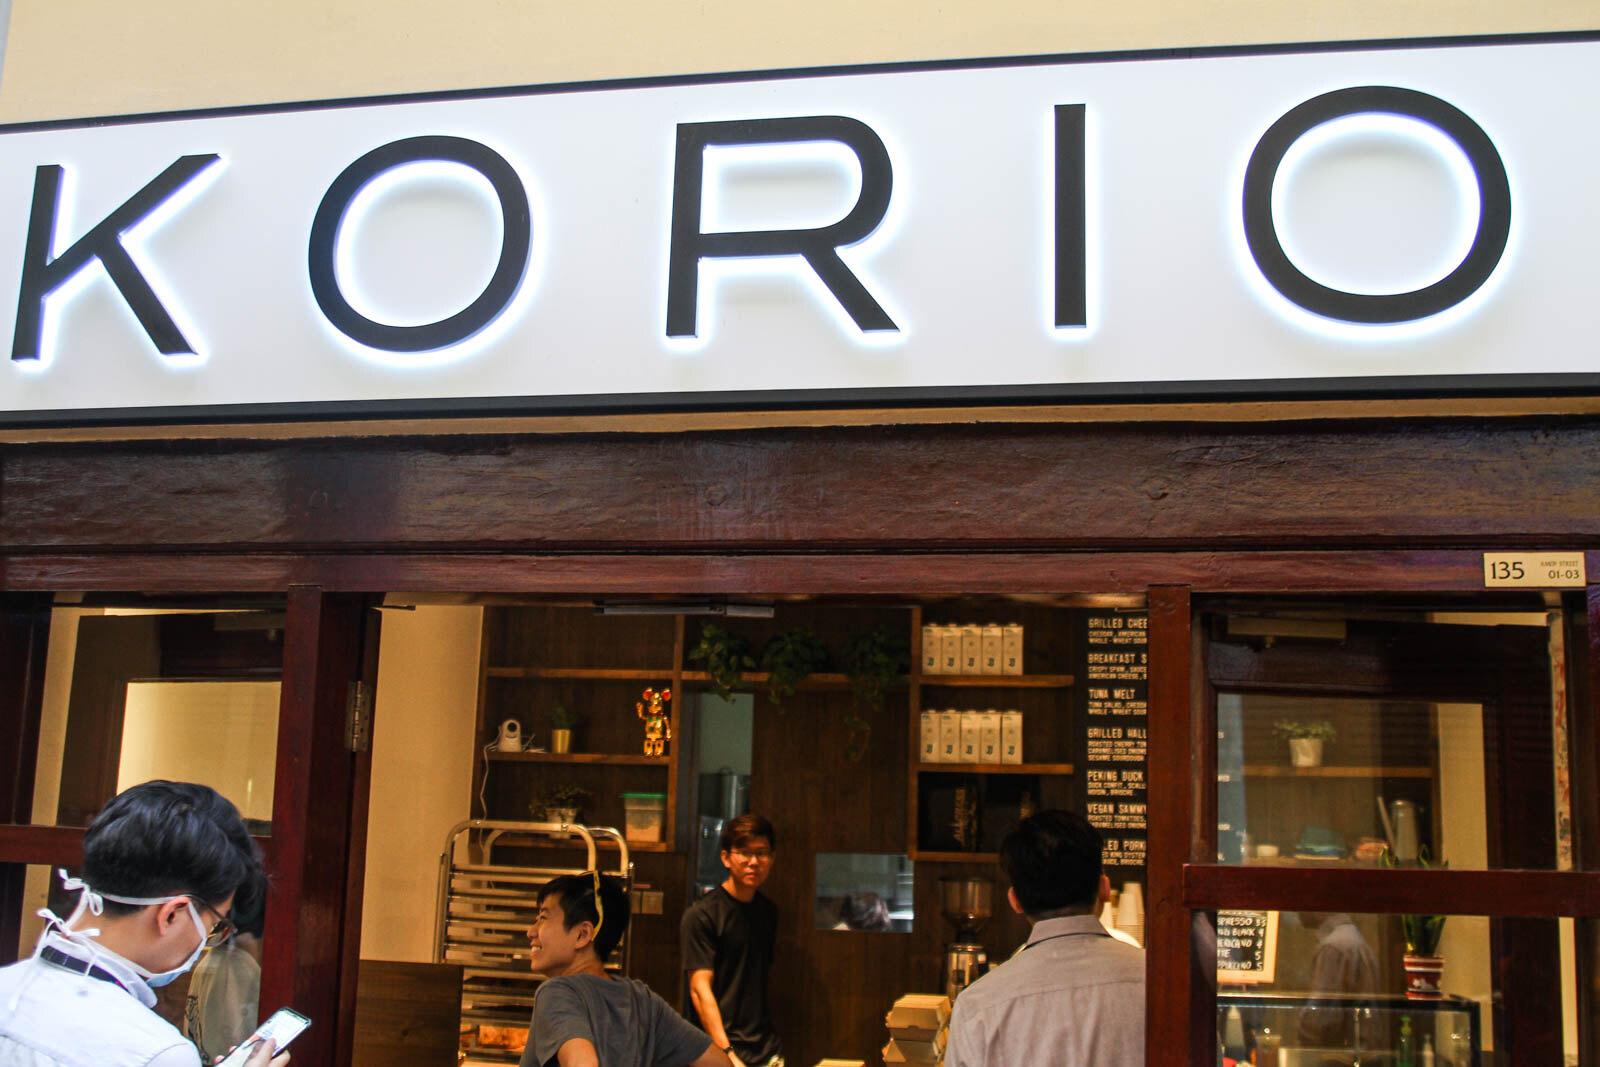 Korio Shopfront